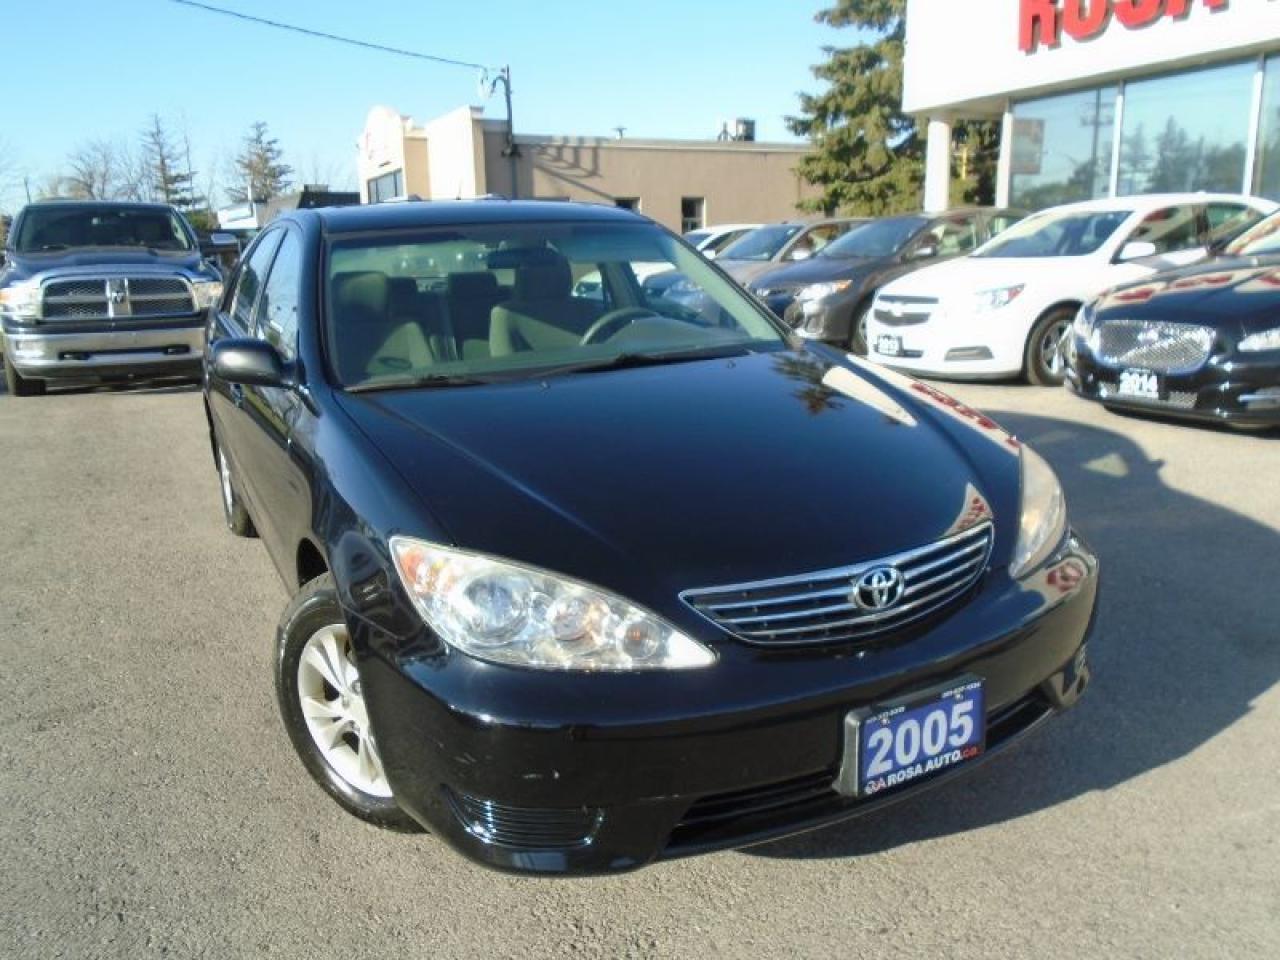 Photo of Black 2005 Toyota Camry